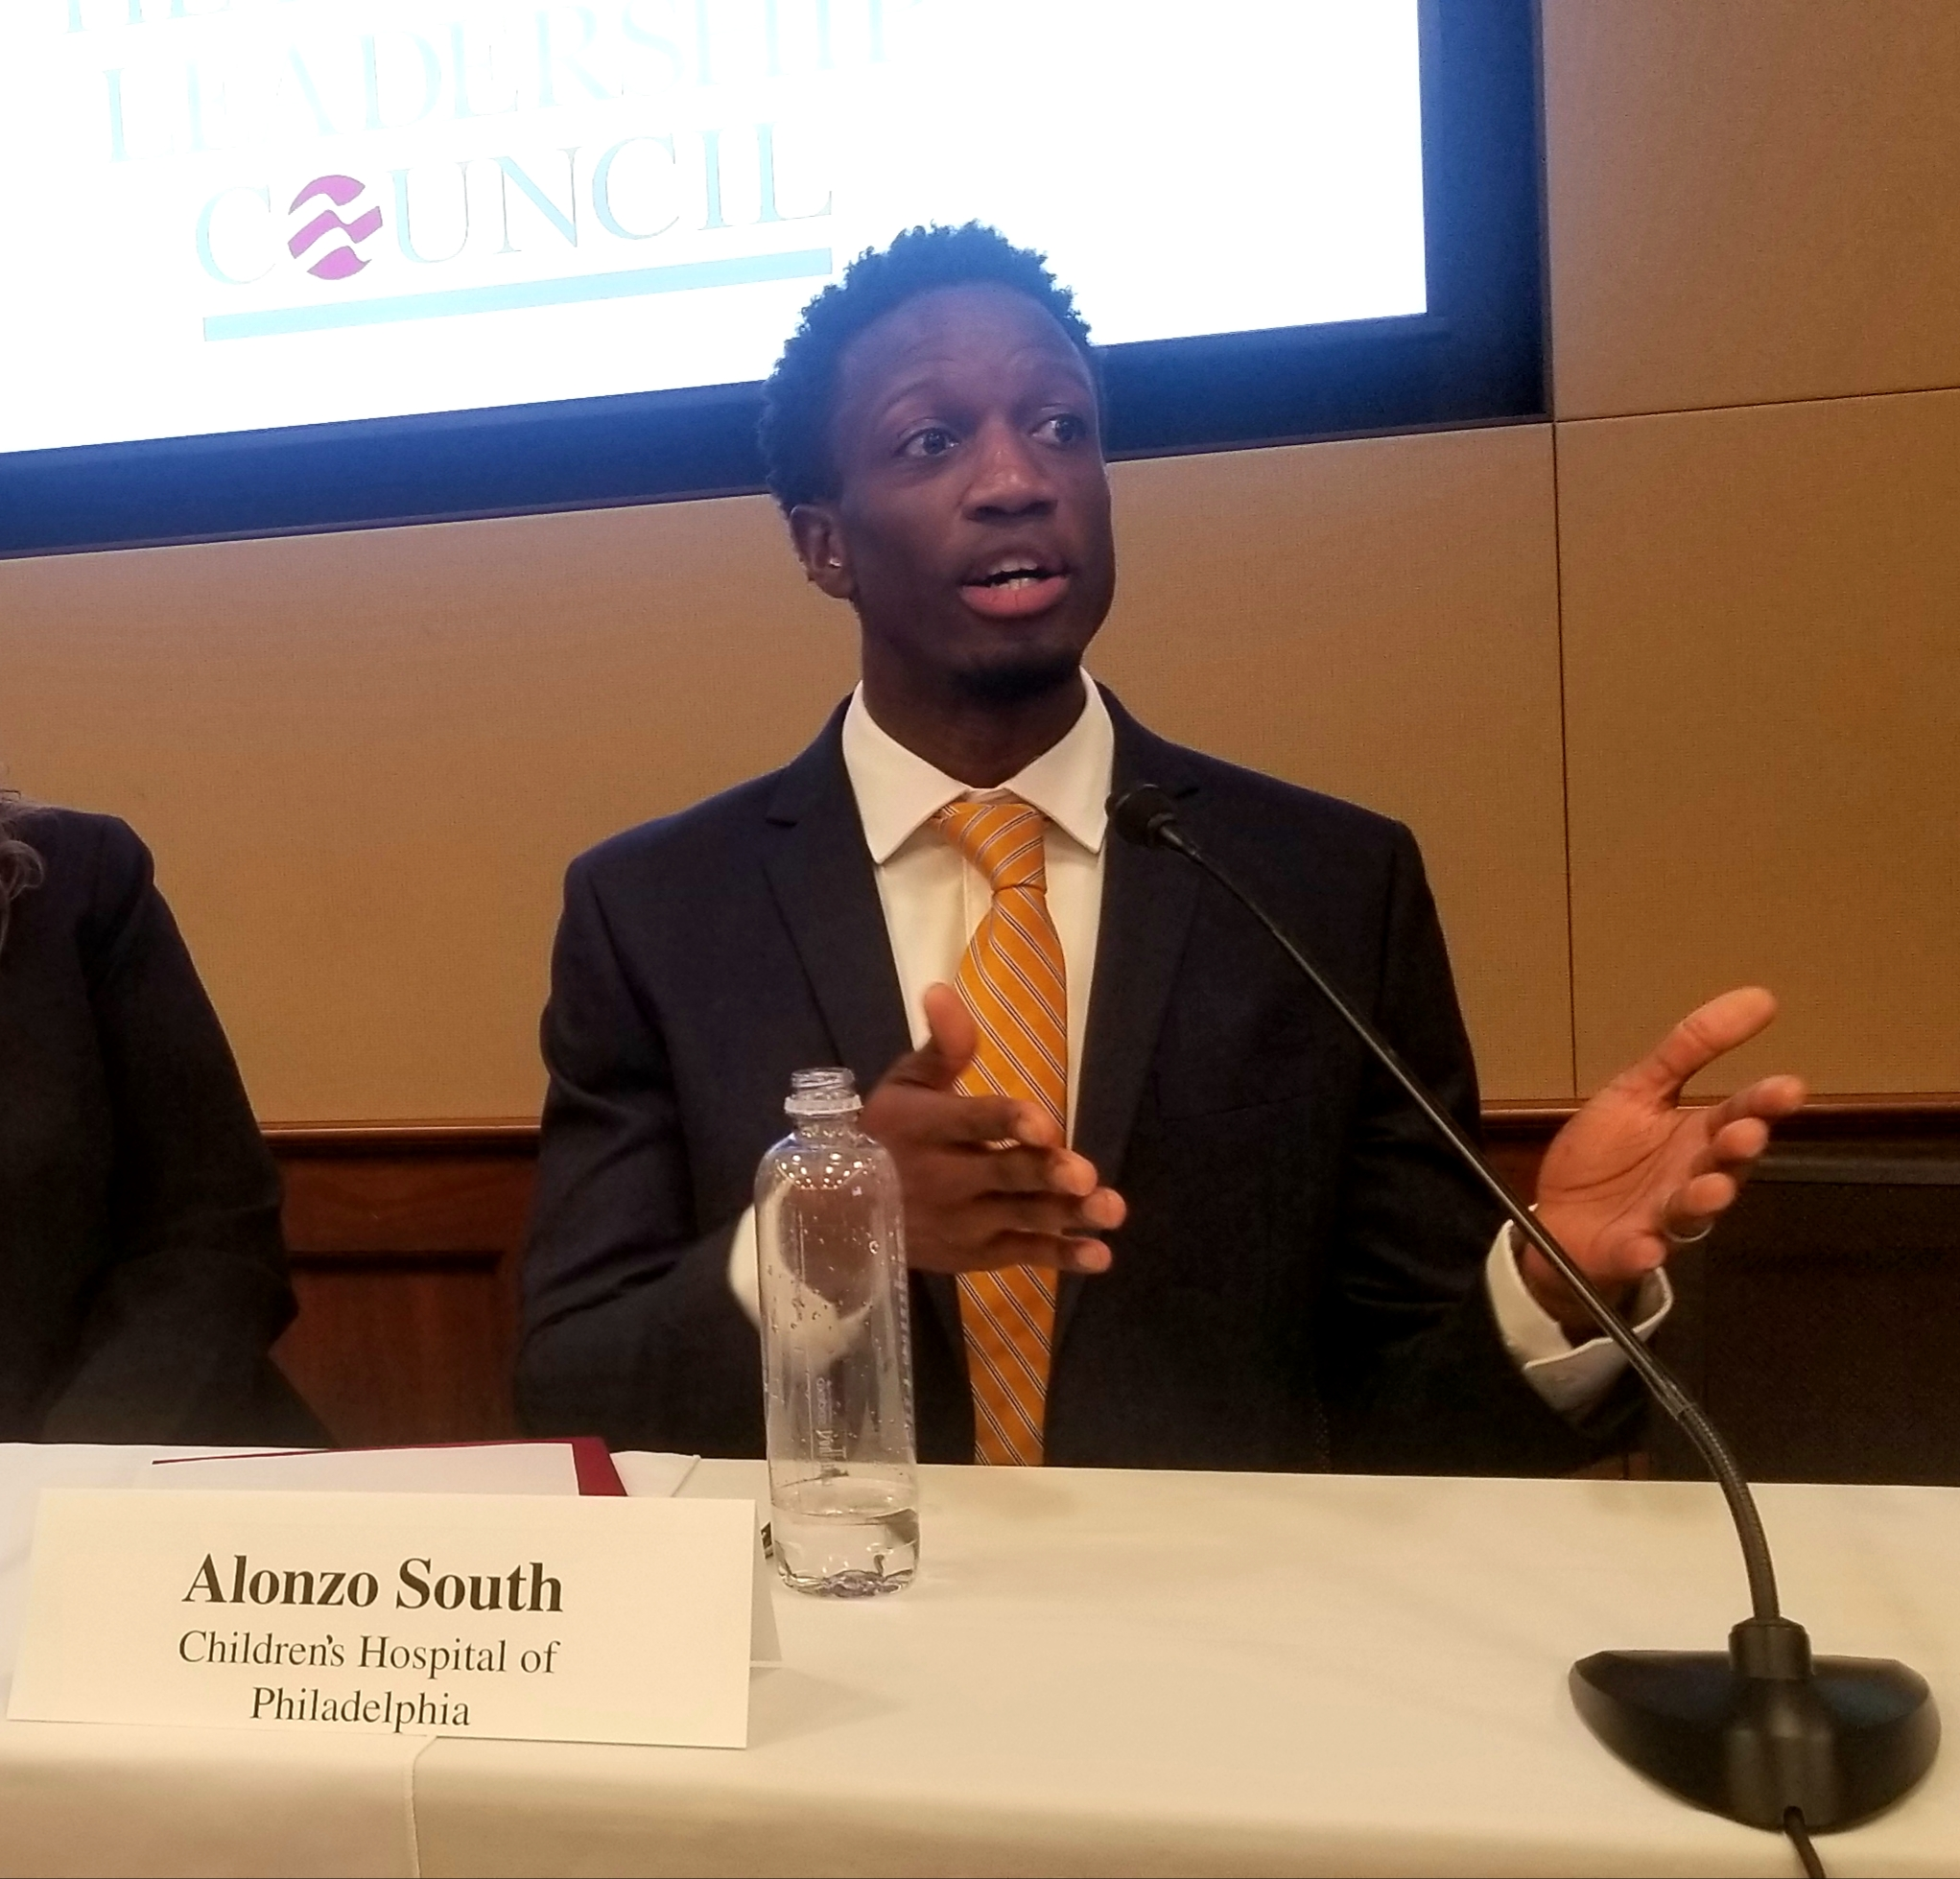 Alonzo South, Senior Director of Community Engagement, Children's Hospital of Philadelphia